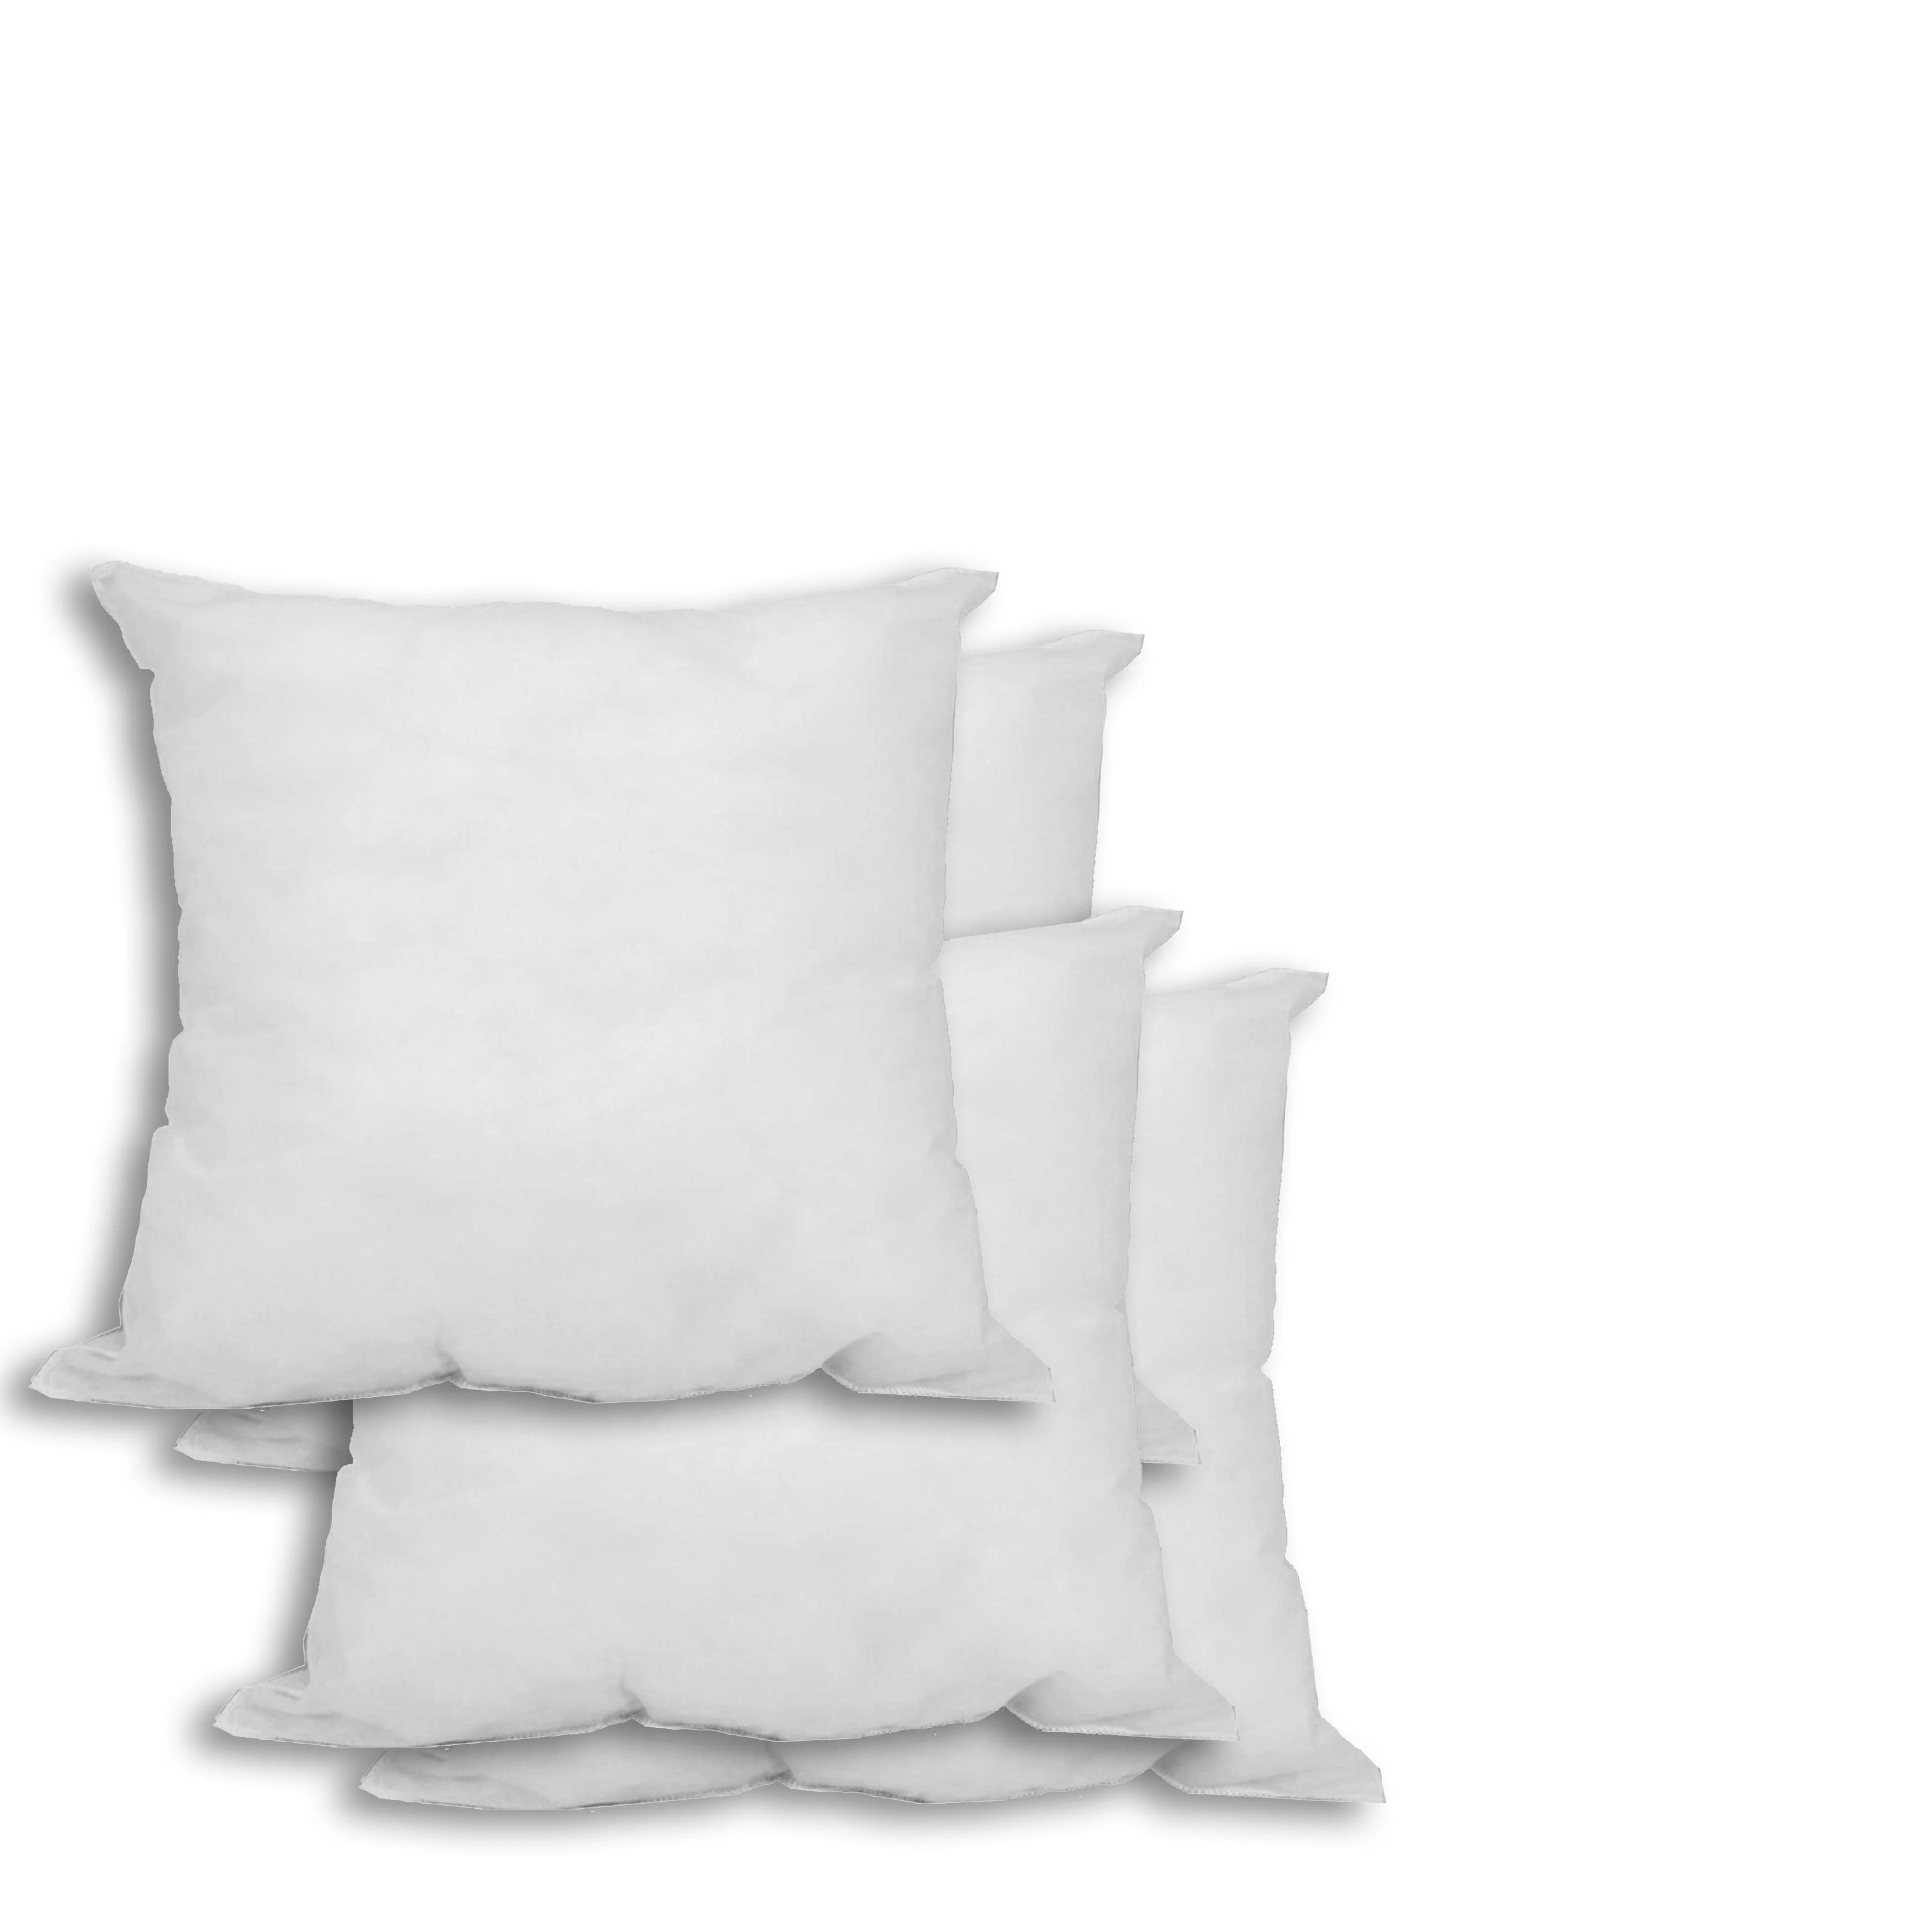 set of 4 12 x 12 premium hypoallergenic stuffer pillow insert square white